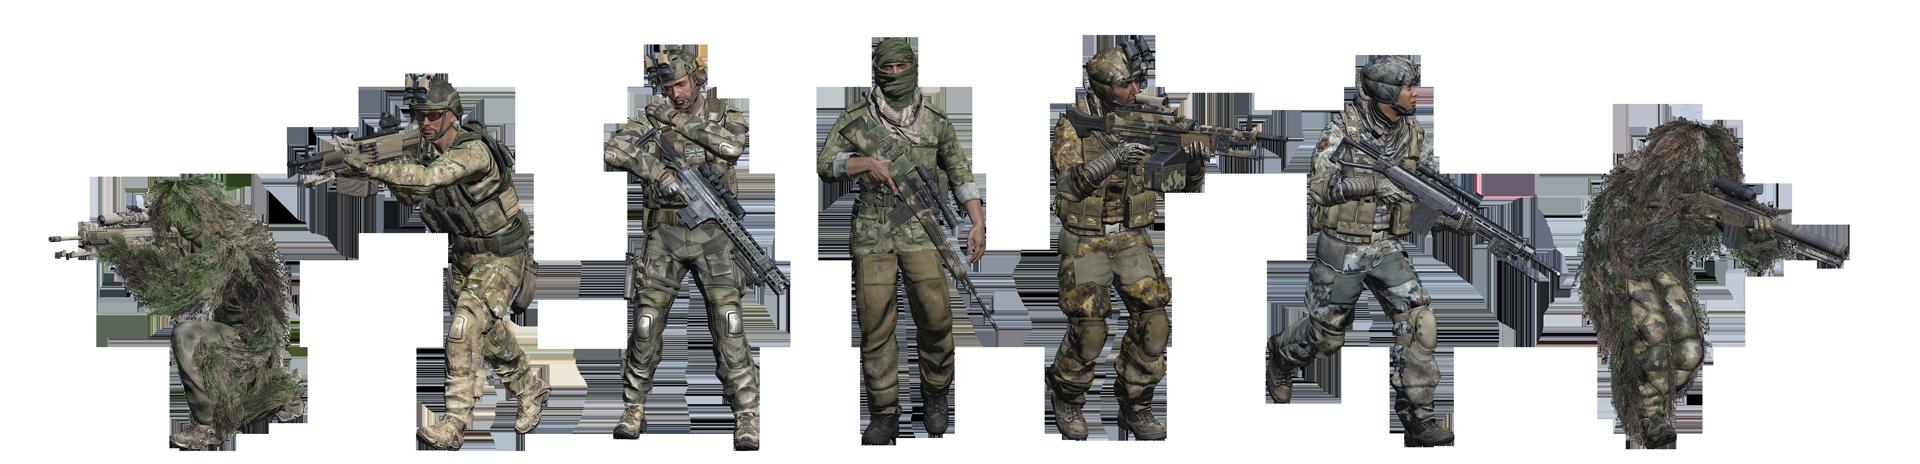 Arma 3 Marksmen DLC станет доступно 8 апреля